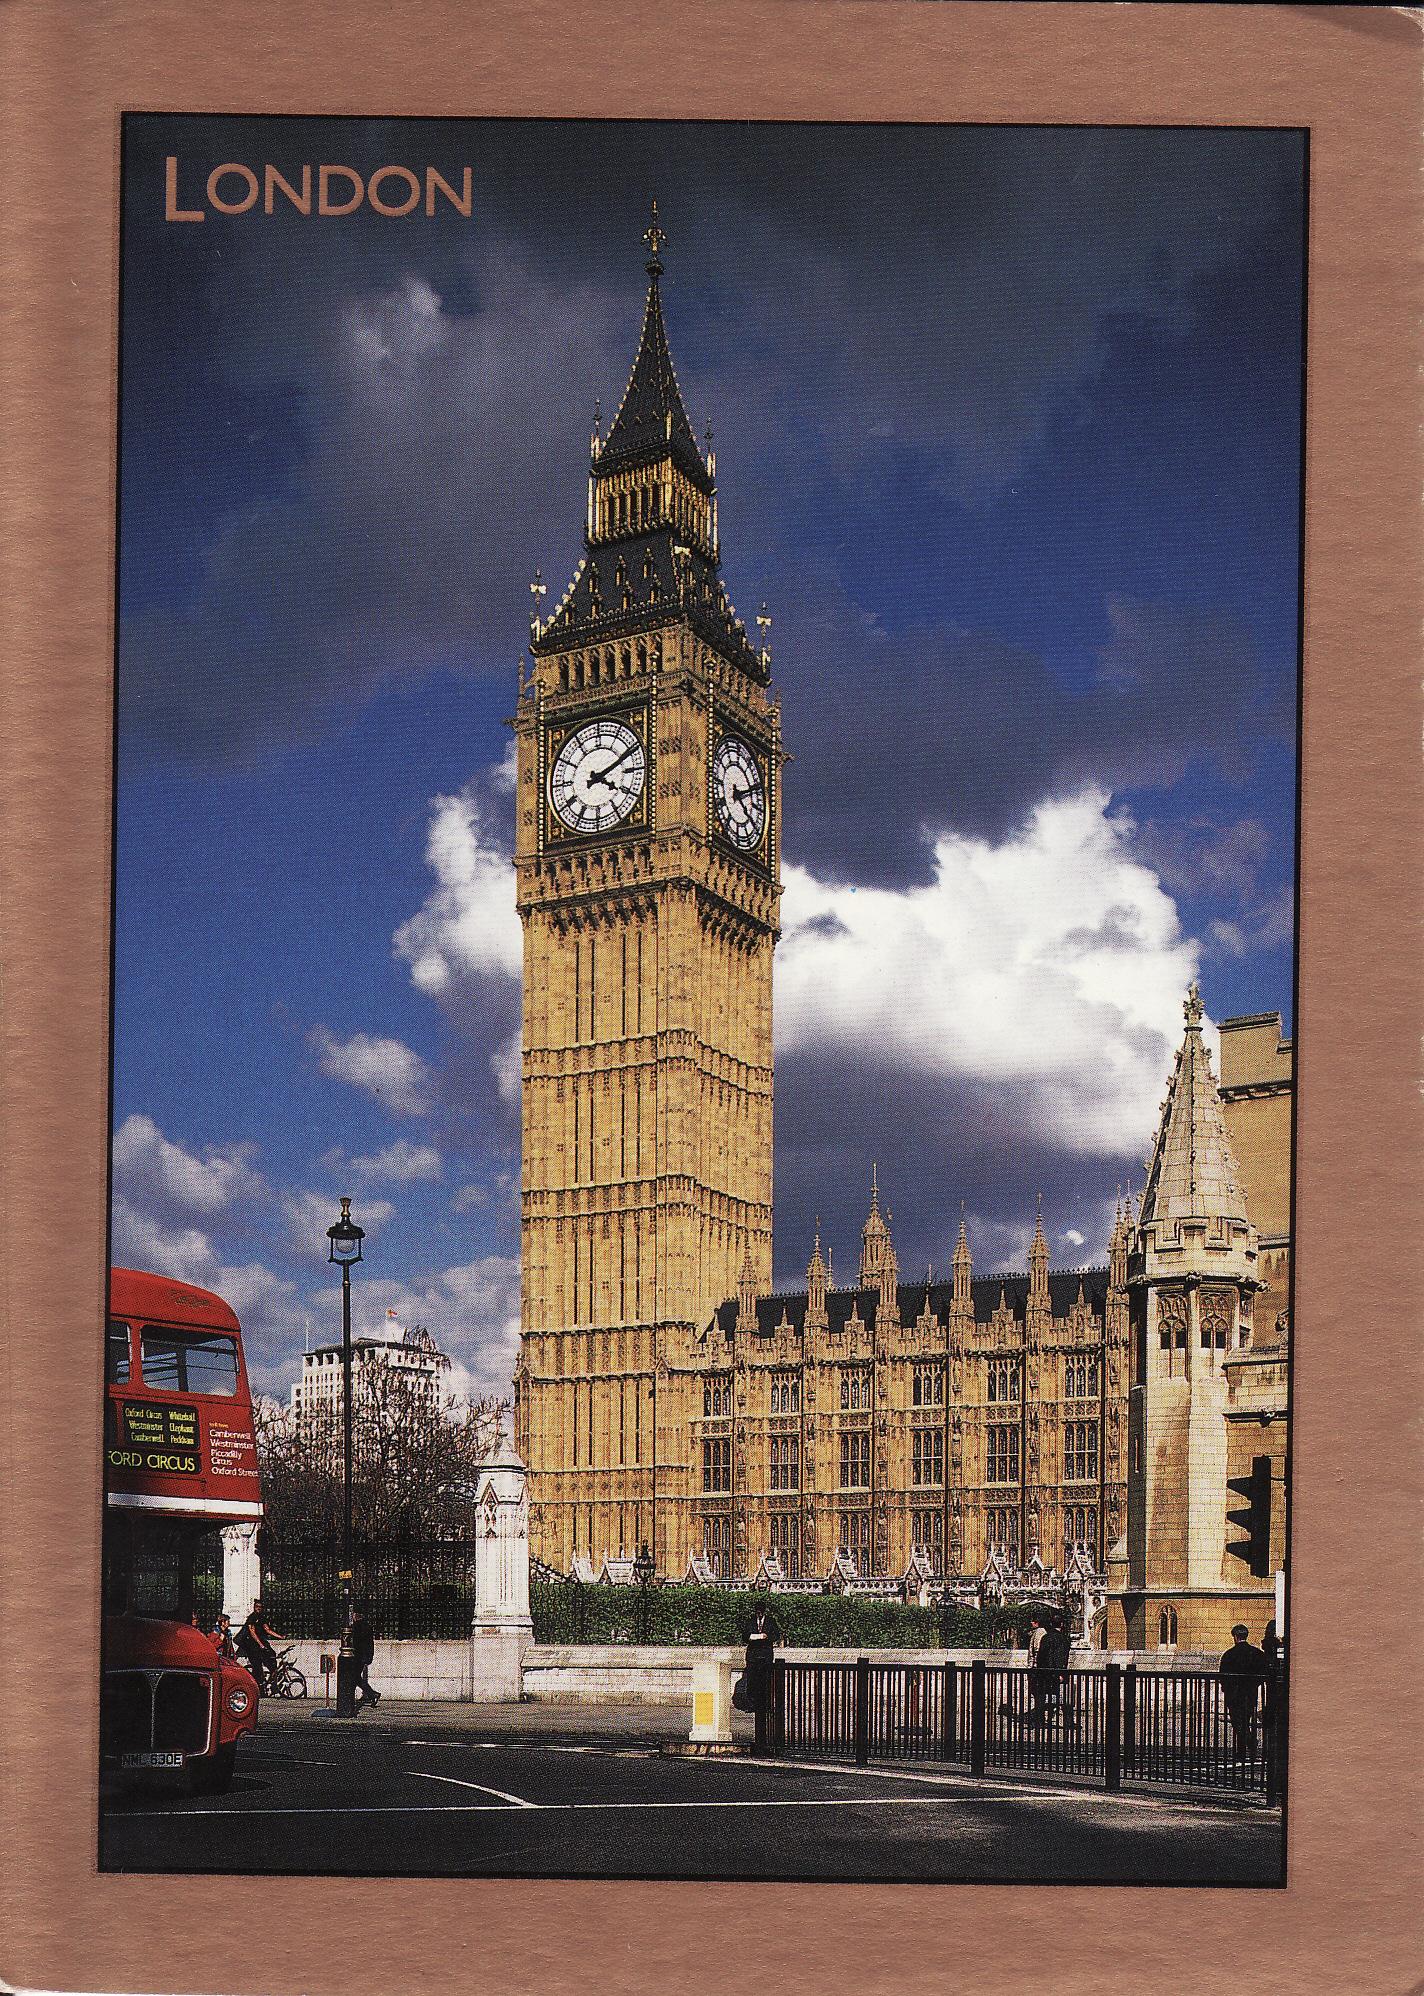 C:\Documents and Settings\Оля\Рабочий стол\ДОКУМЕНТЫ WORD\Школьная документация\Картинки Лондона\IMG_0011.jpg